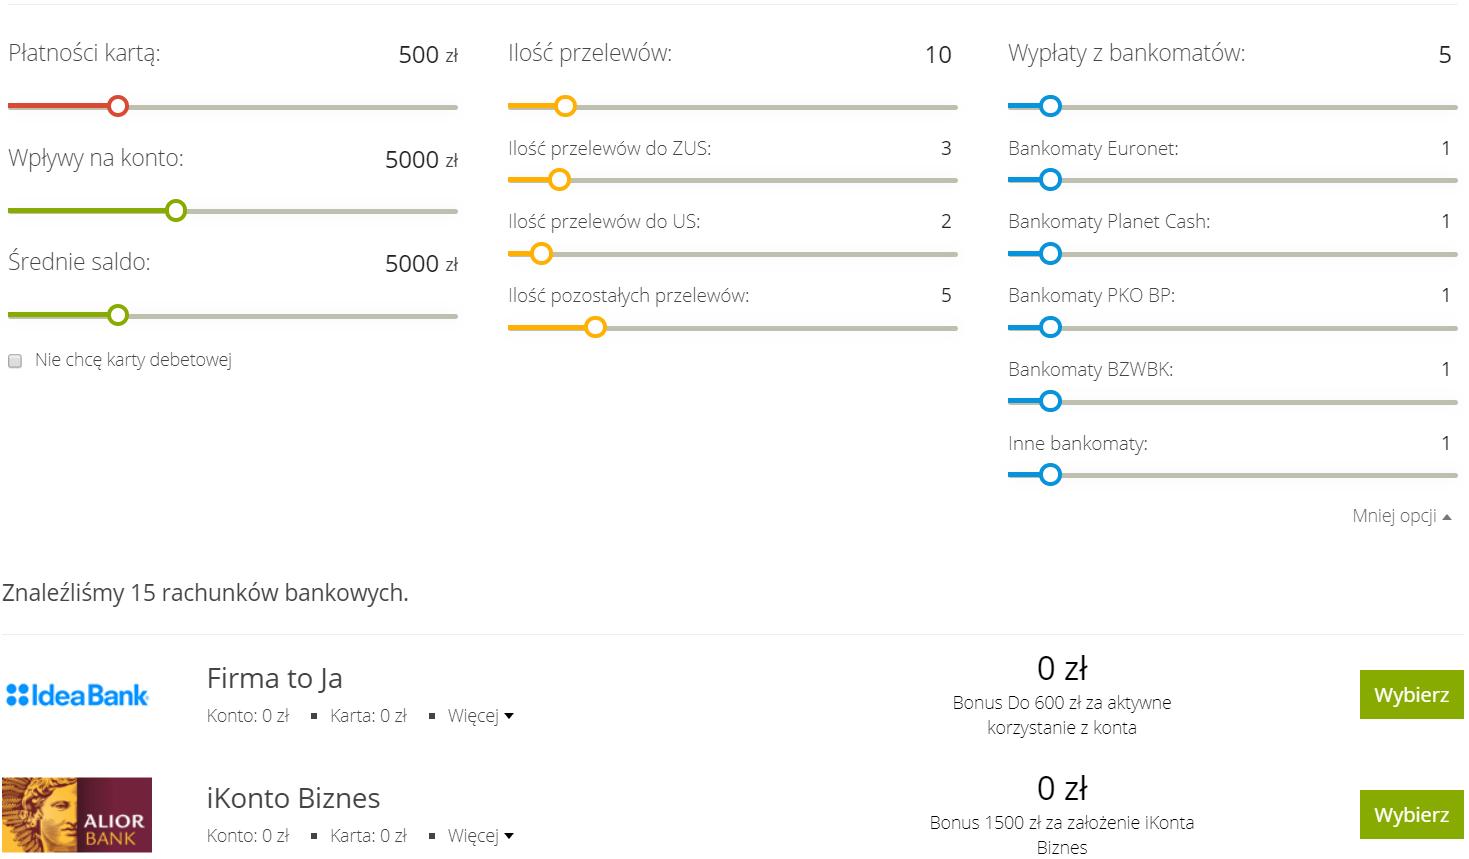 Ranking kont